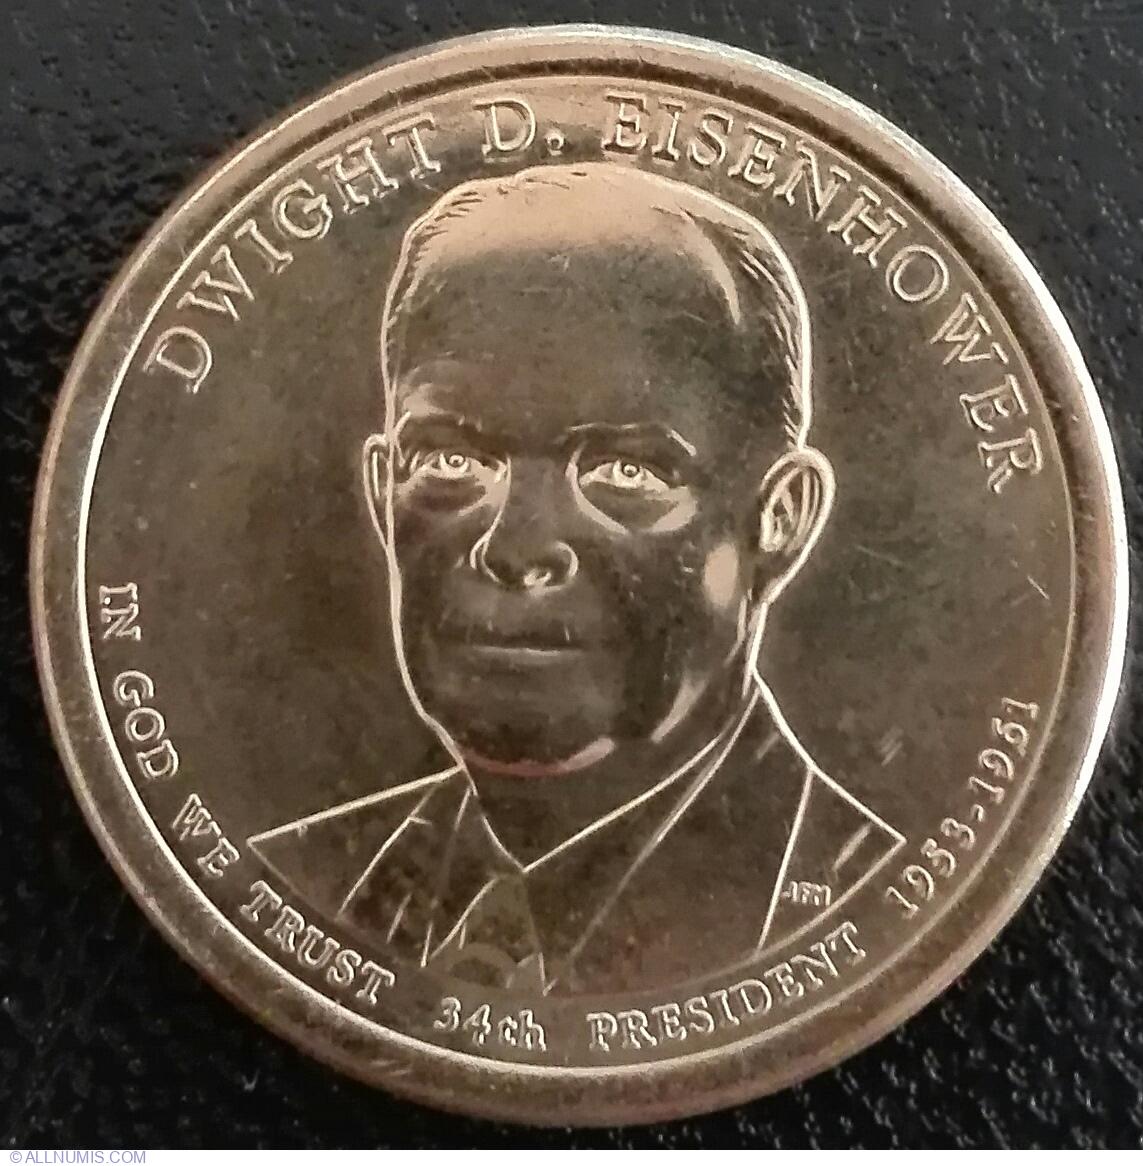 Dwight D 2015 D Eisenhower One Dollar Presidential Coin